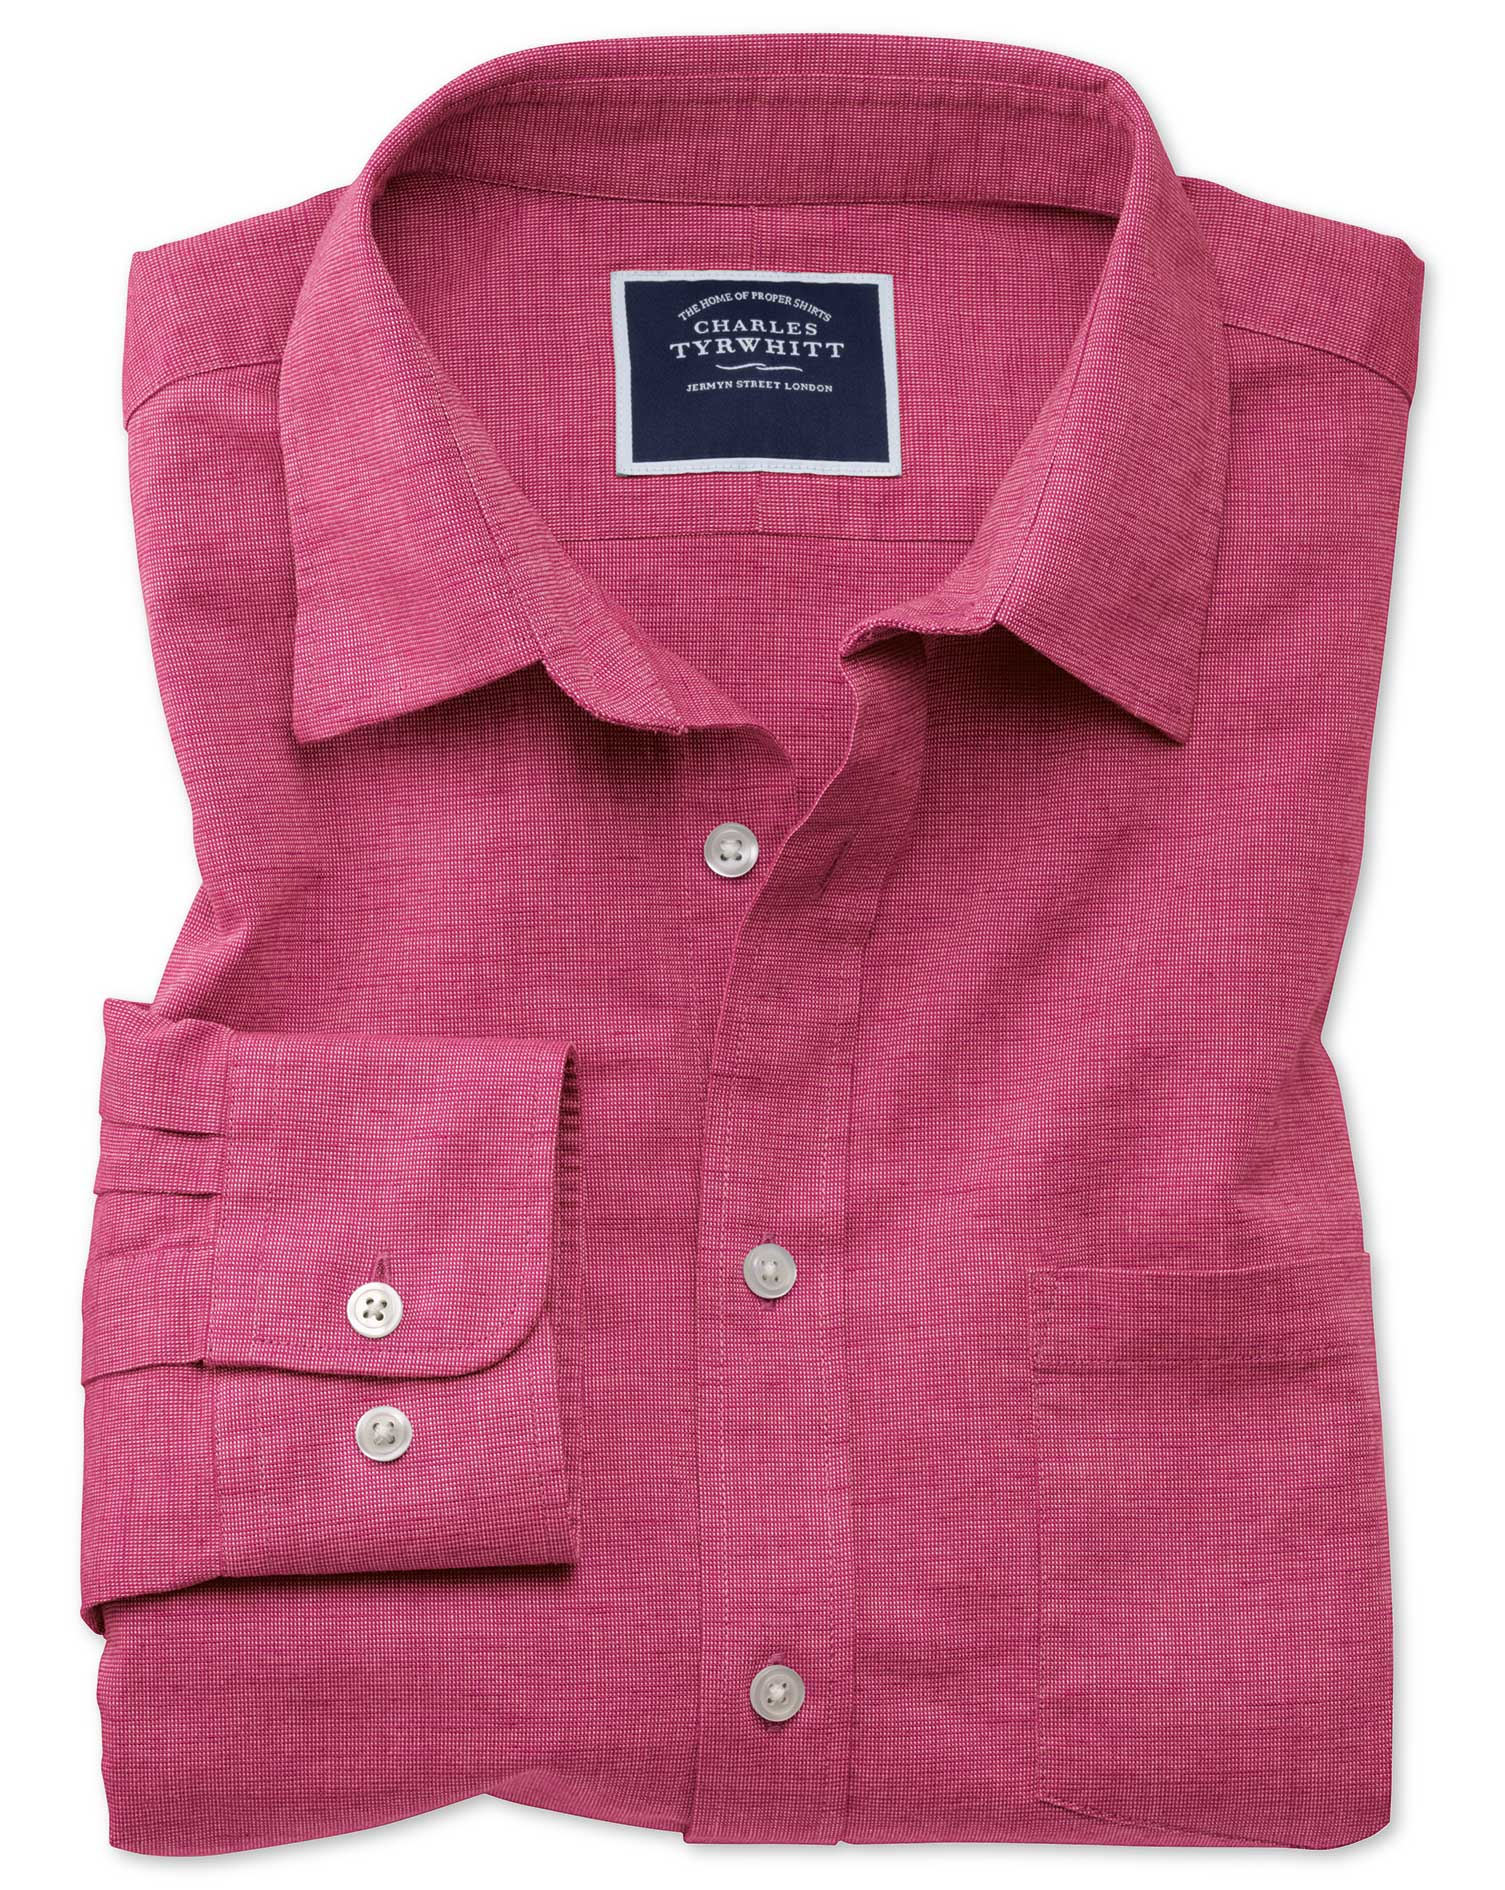 Slim Fit Cotton Linen Bright Pink Plain Shirt Single Cuff Size Large by Charles Tyrwhitt